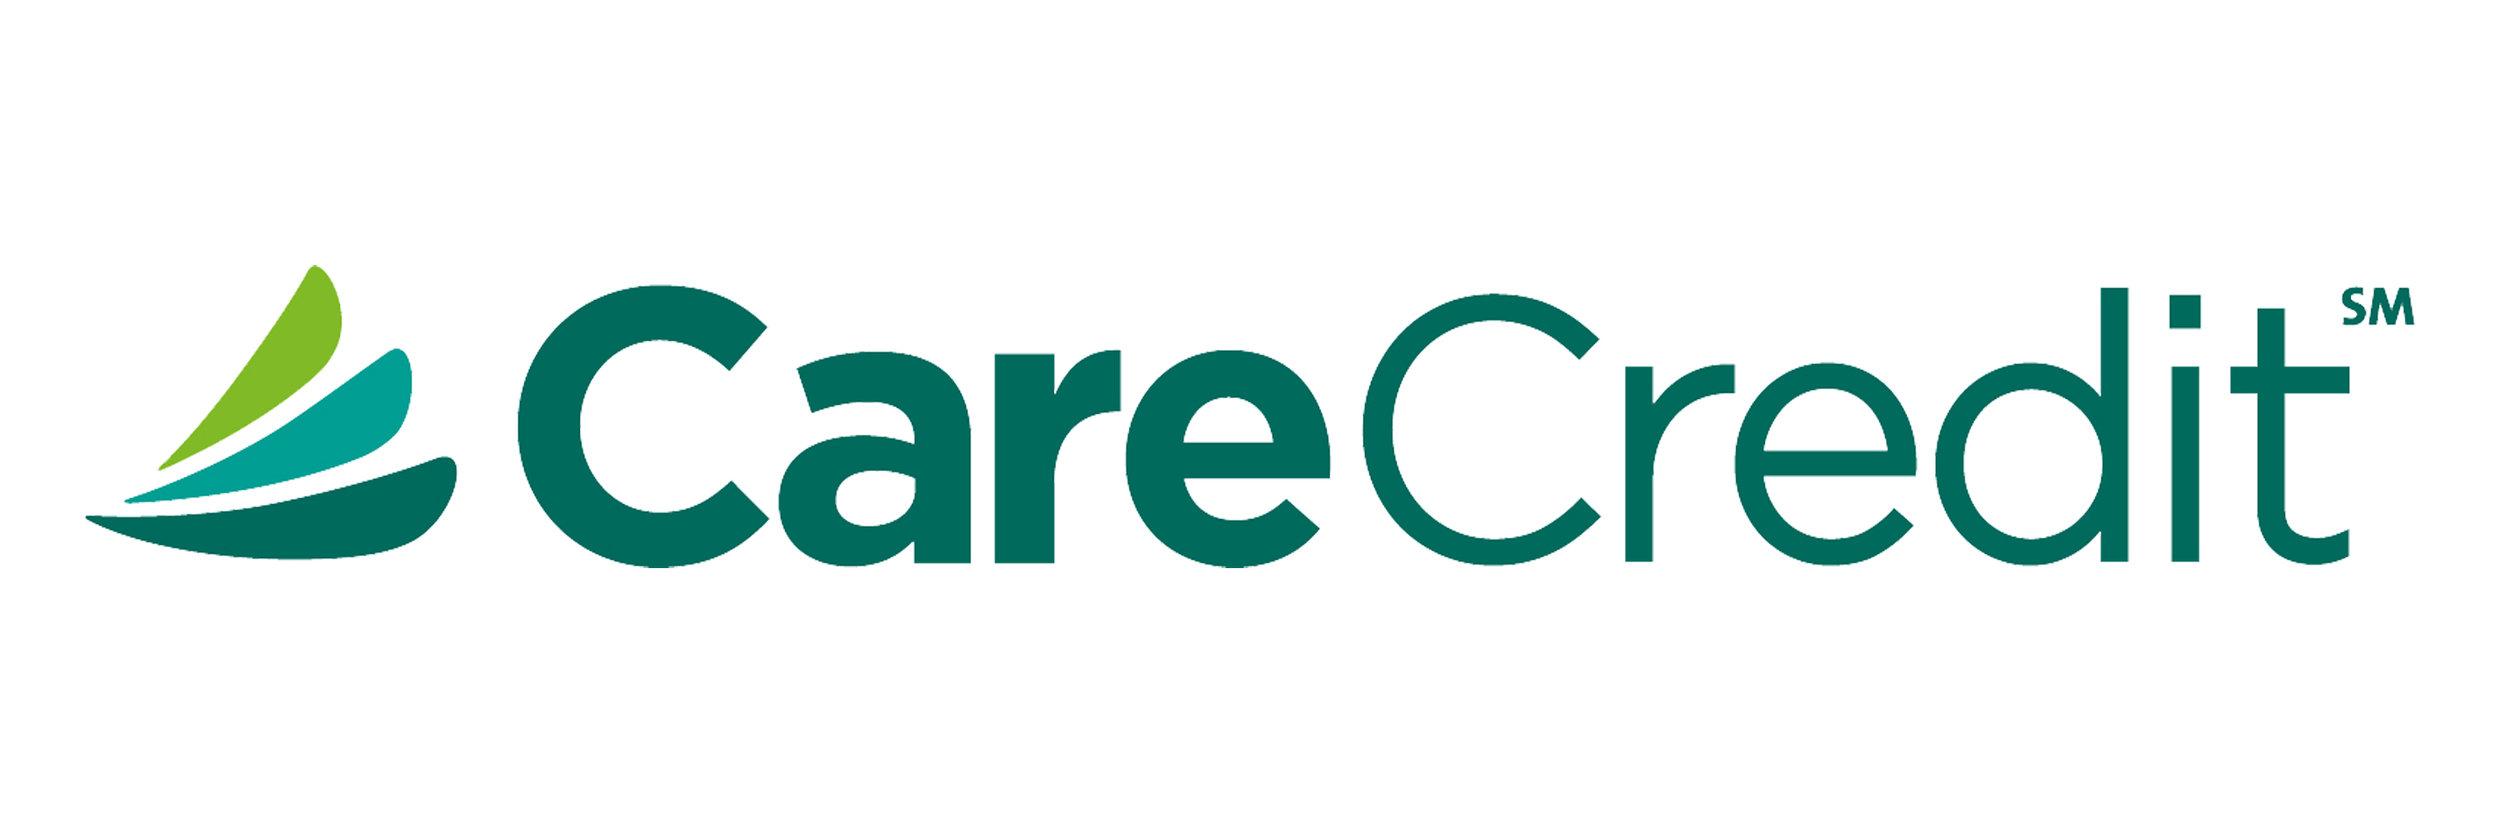 care-credit-banner.jpg